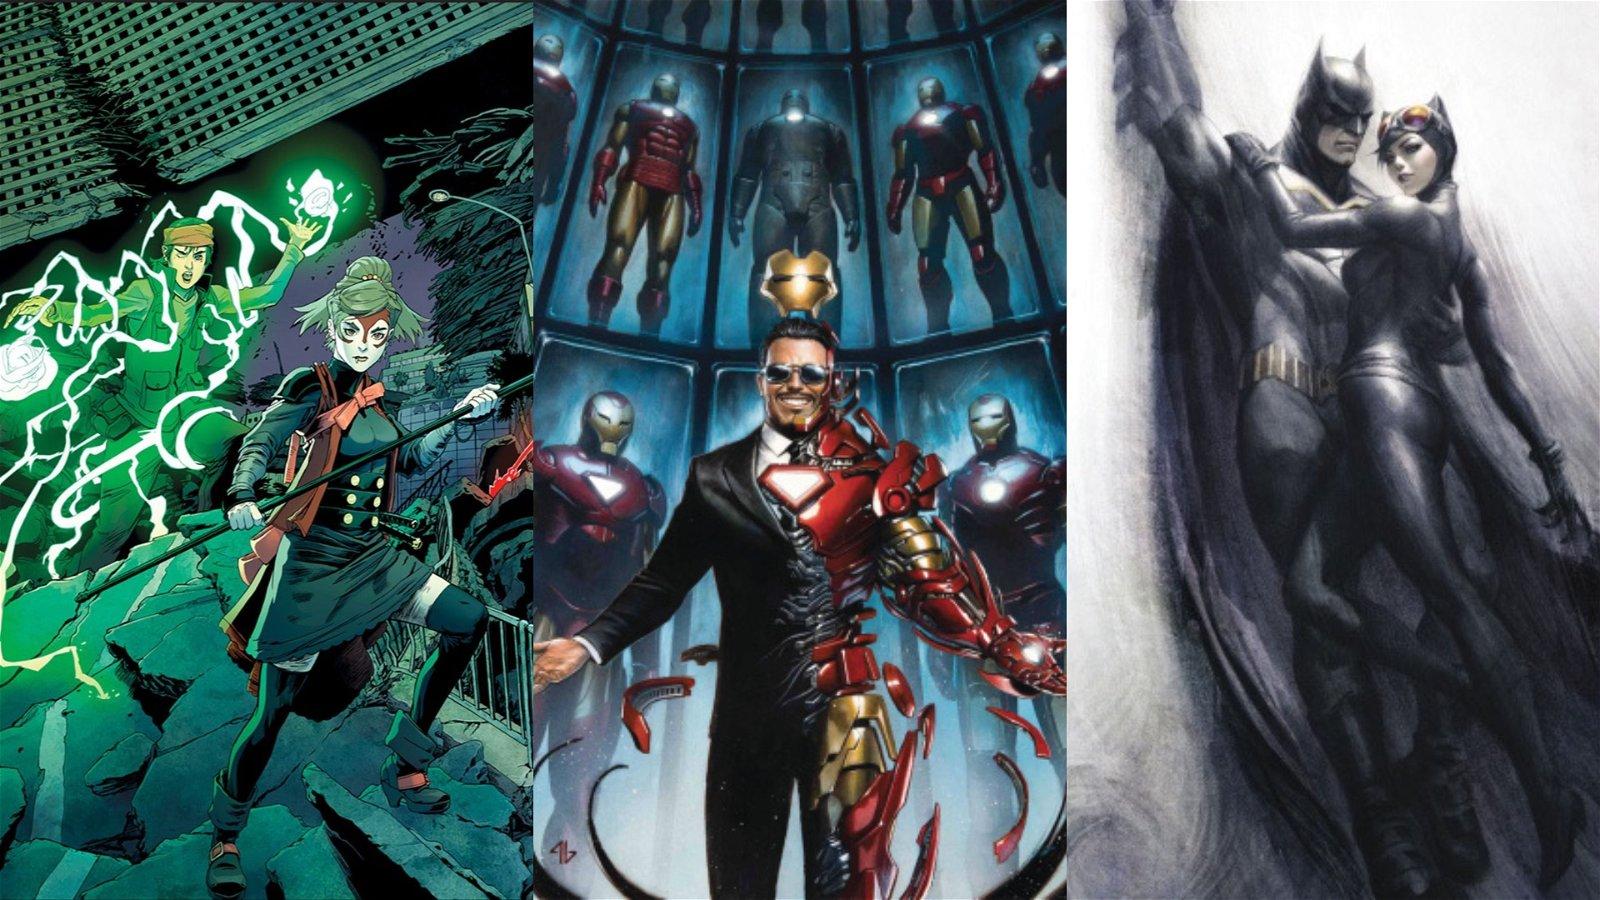 Best Comics to Buy This Week: Tony Stark Returns in Iron Man #1 1